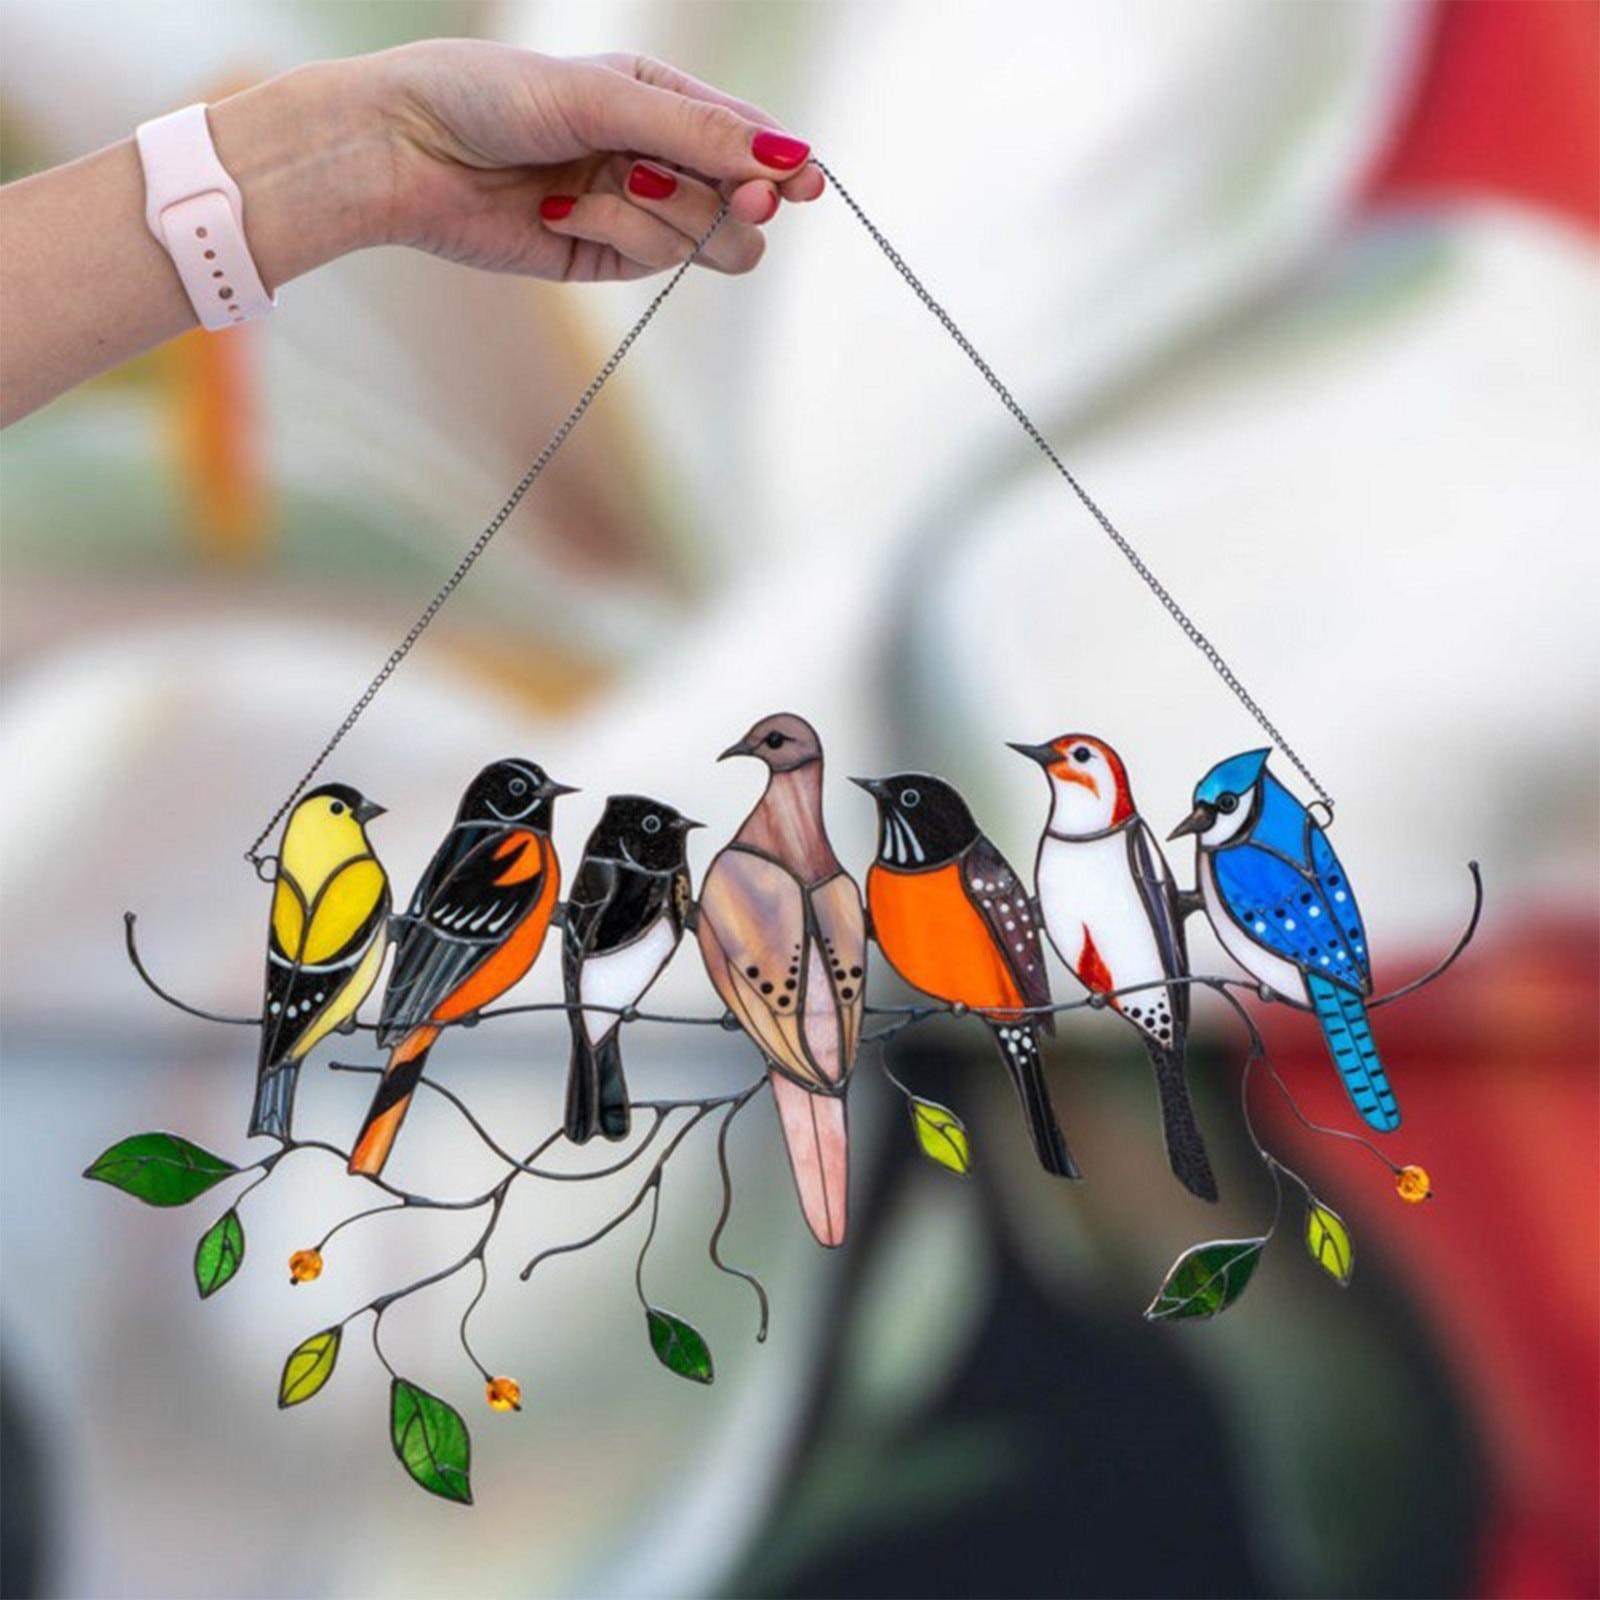 Multicolor Birds On A Wire High Stained Glass Suncatcher Window Panel Decoración De Habitación Декор Для Комнаты 15CM*25CM